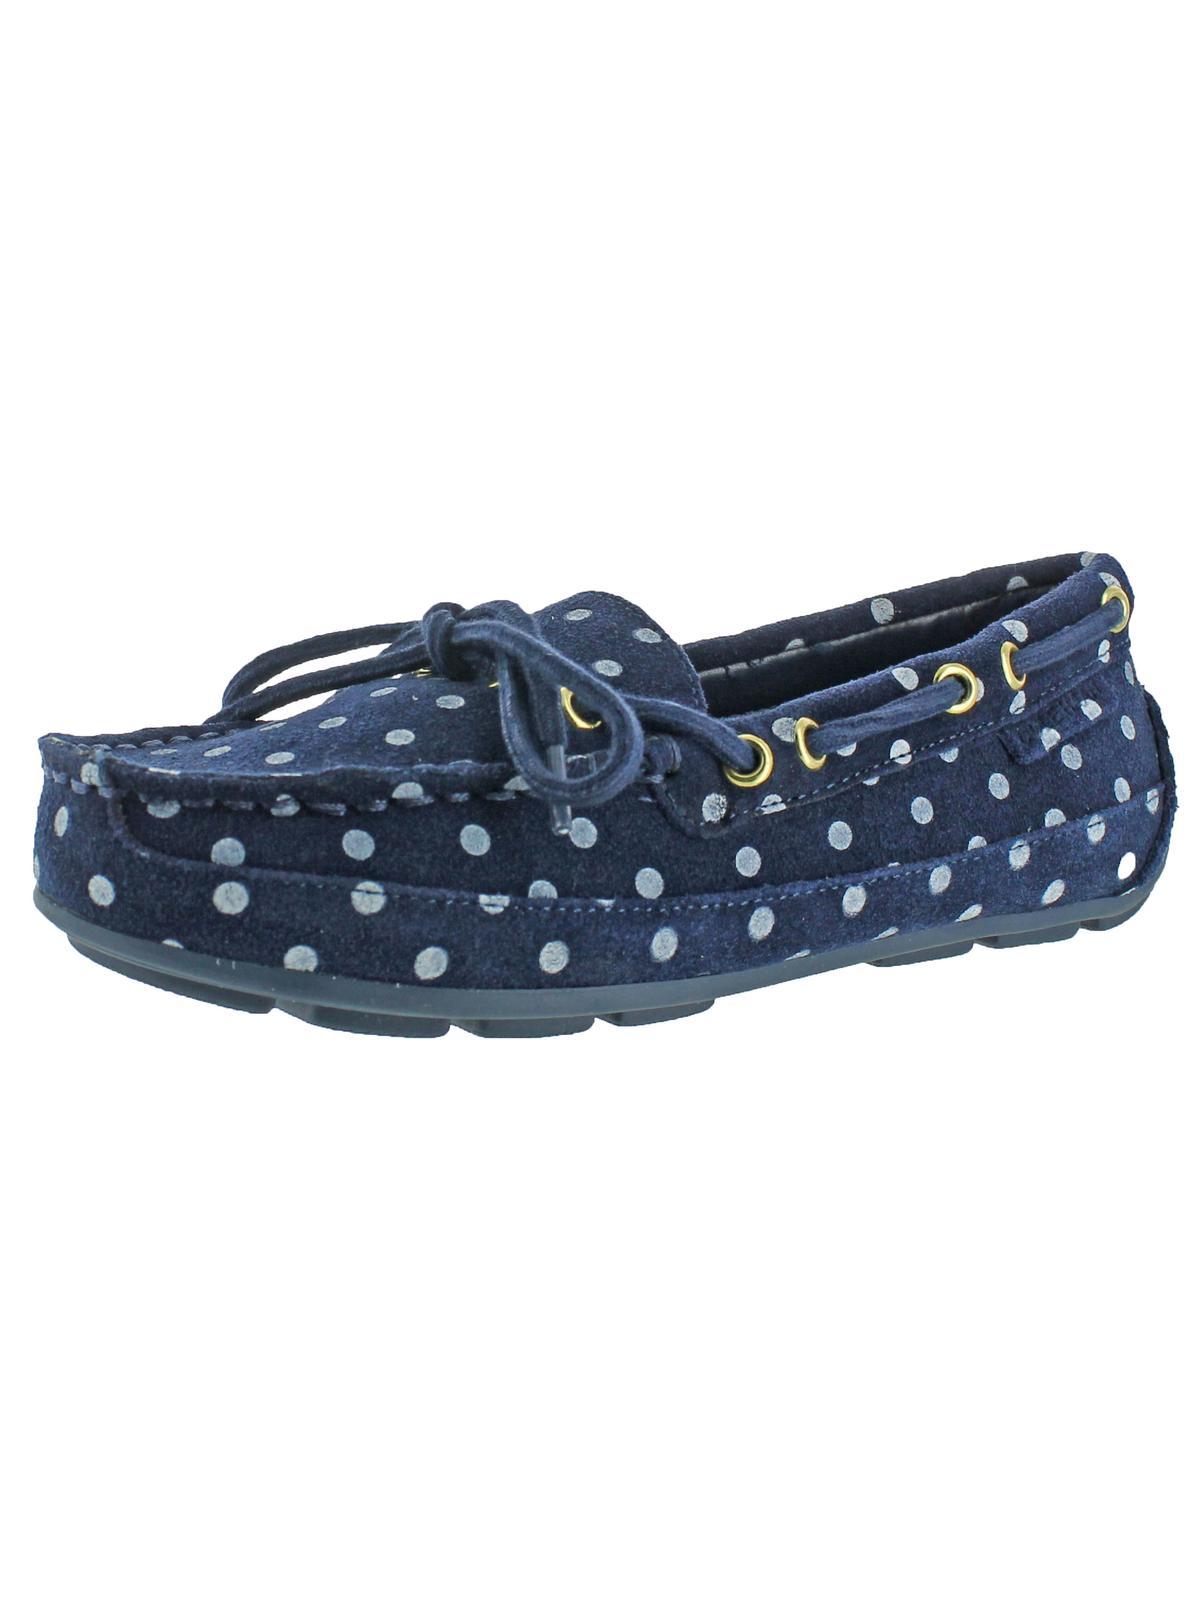 ee958ef3d70b9c Cole Haan - Cole Haan Girls Grant Driver Boat Shoes Loafer Driving Moccasins  - Walmart.com